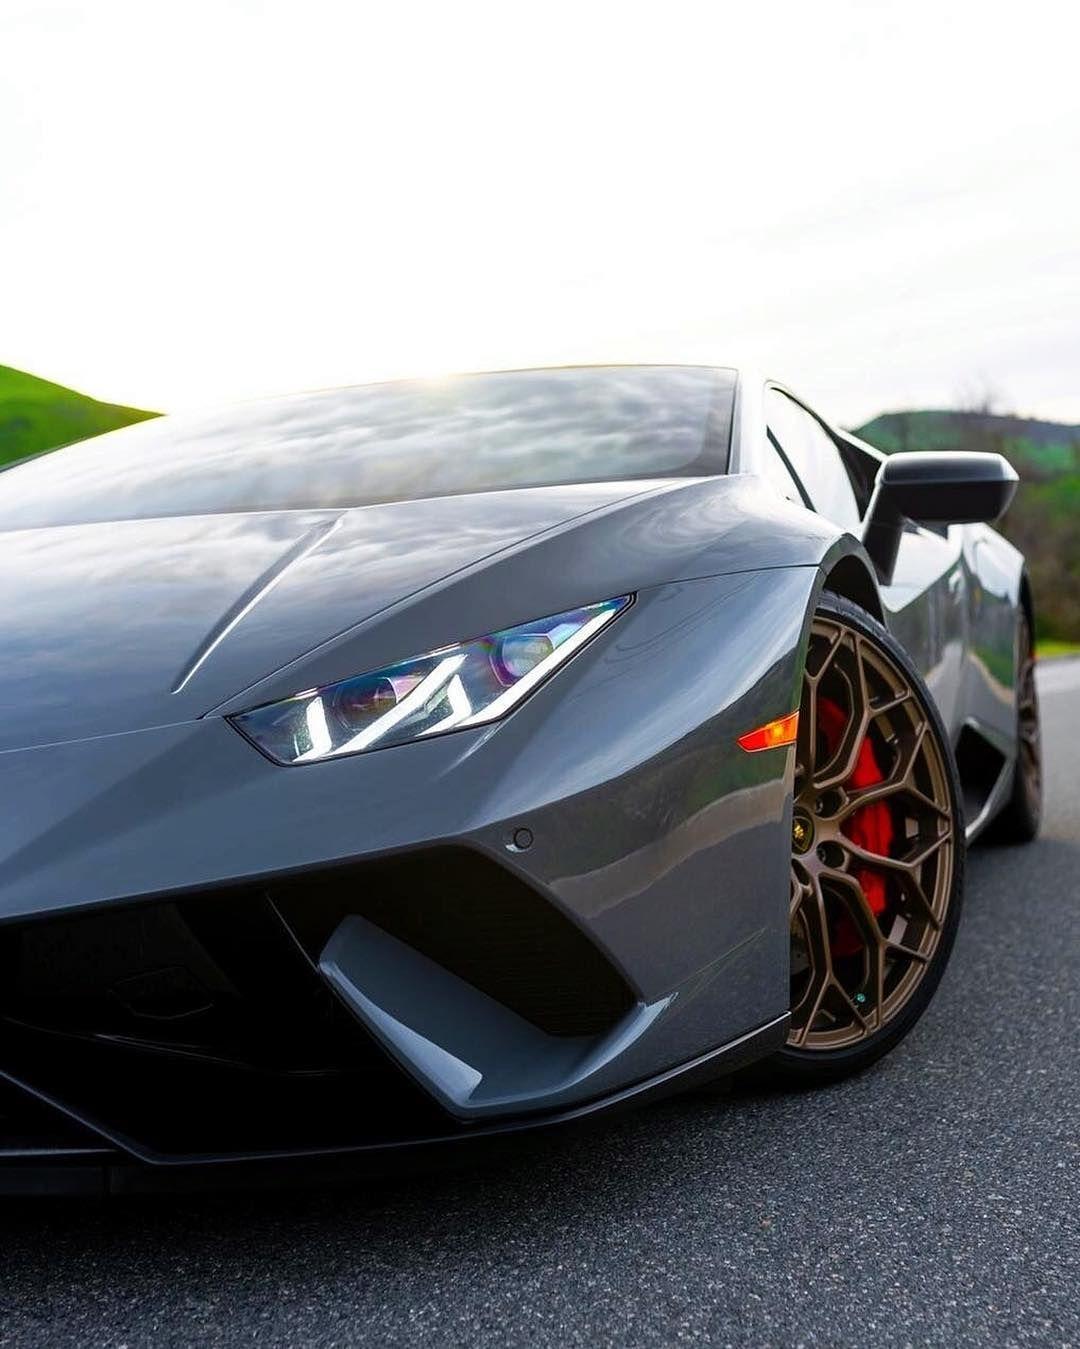 L�ks Otomobil Suv  #cars #luxurycars #sportcars #conceptcars #motorcycles #trucks